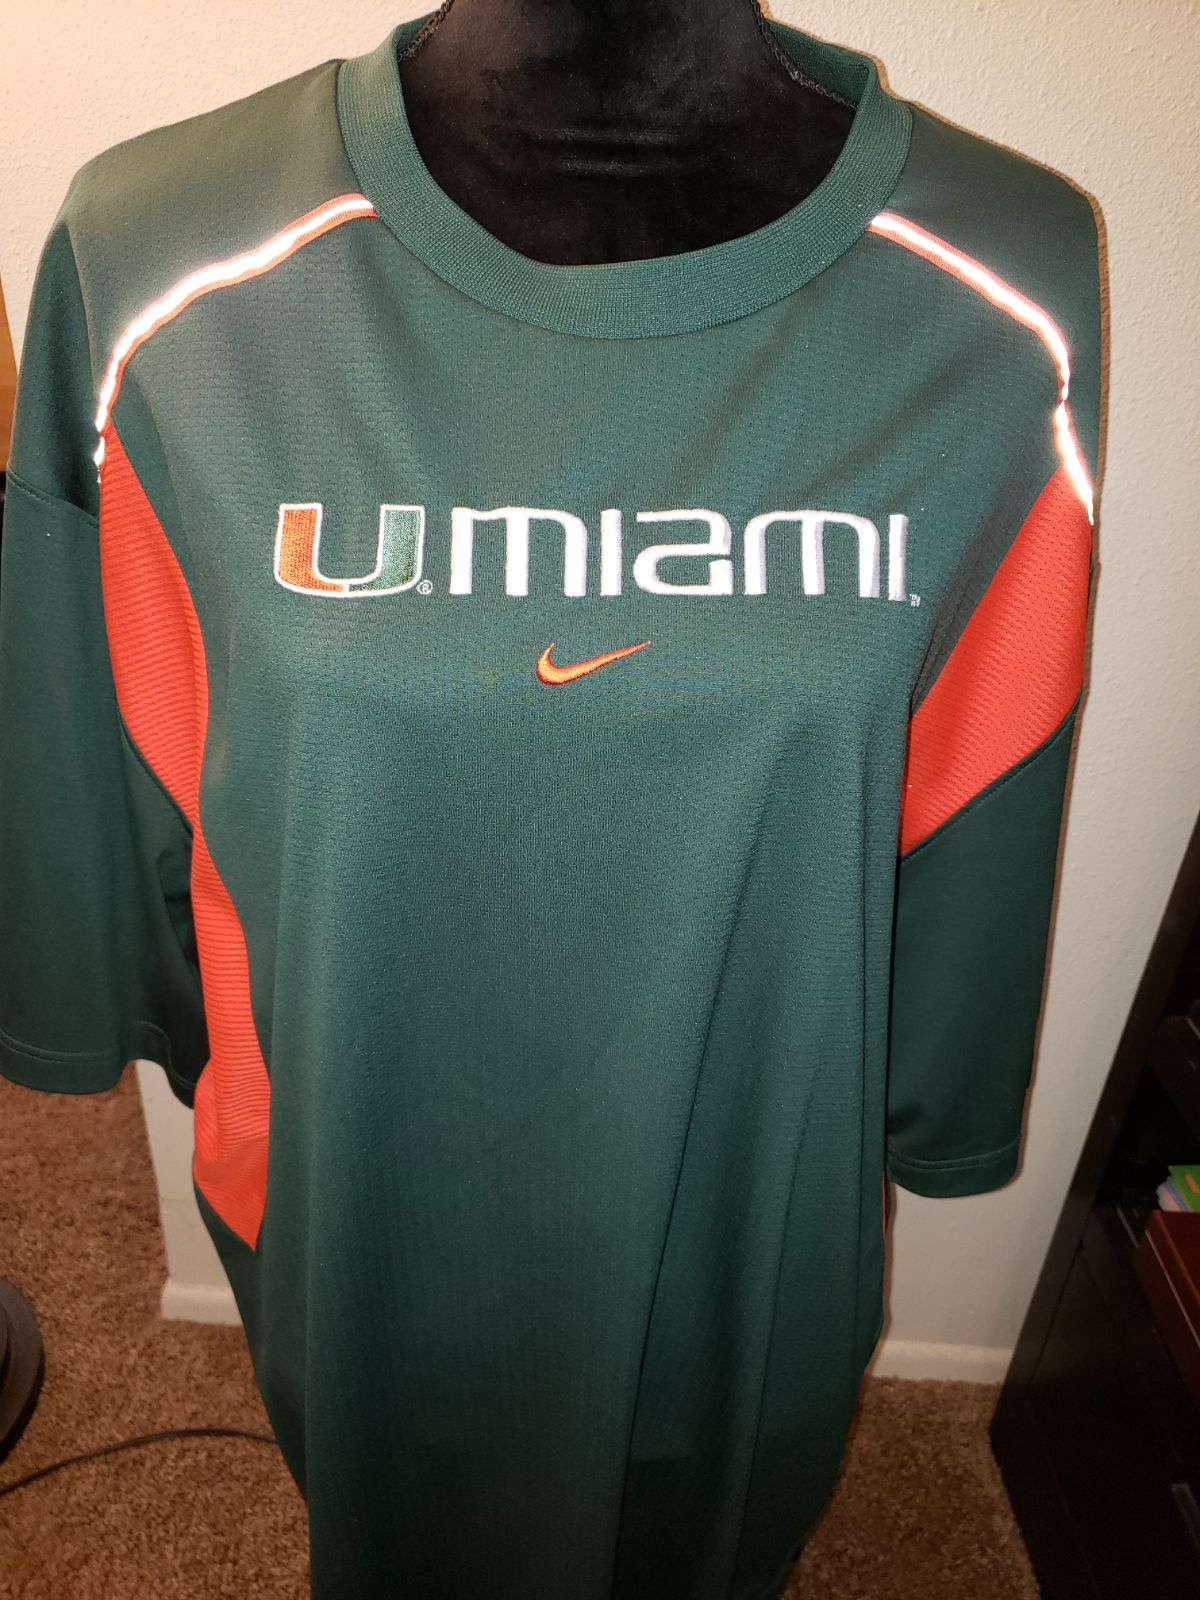 Nike sz. 2xl university of miami mens sh